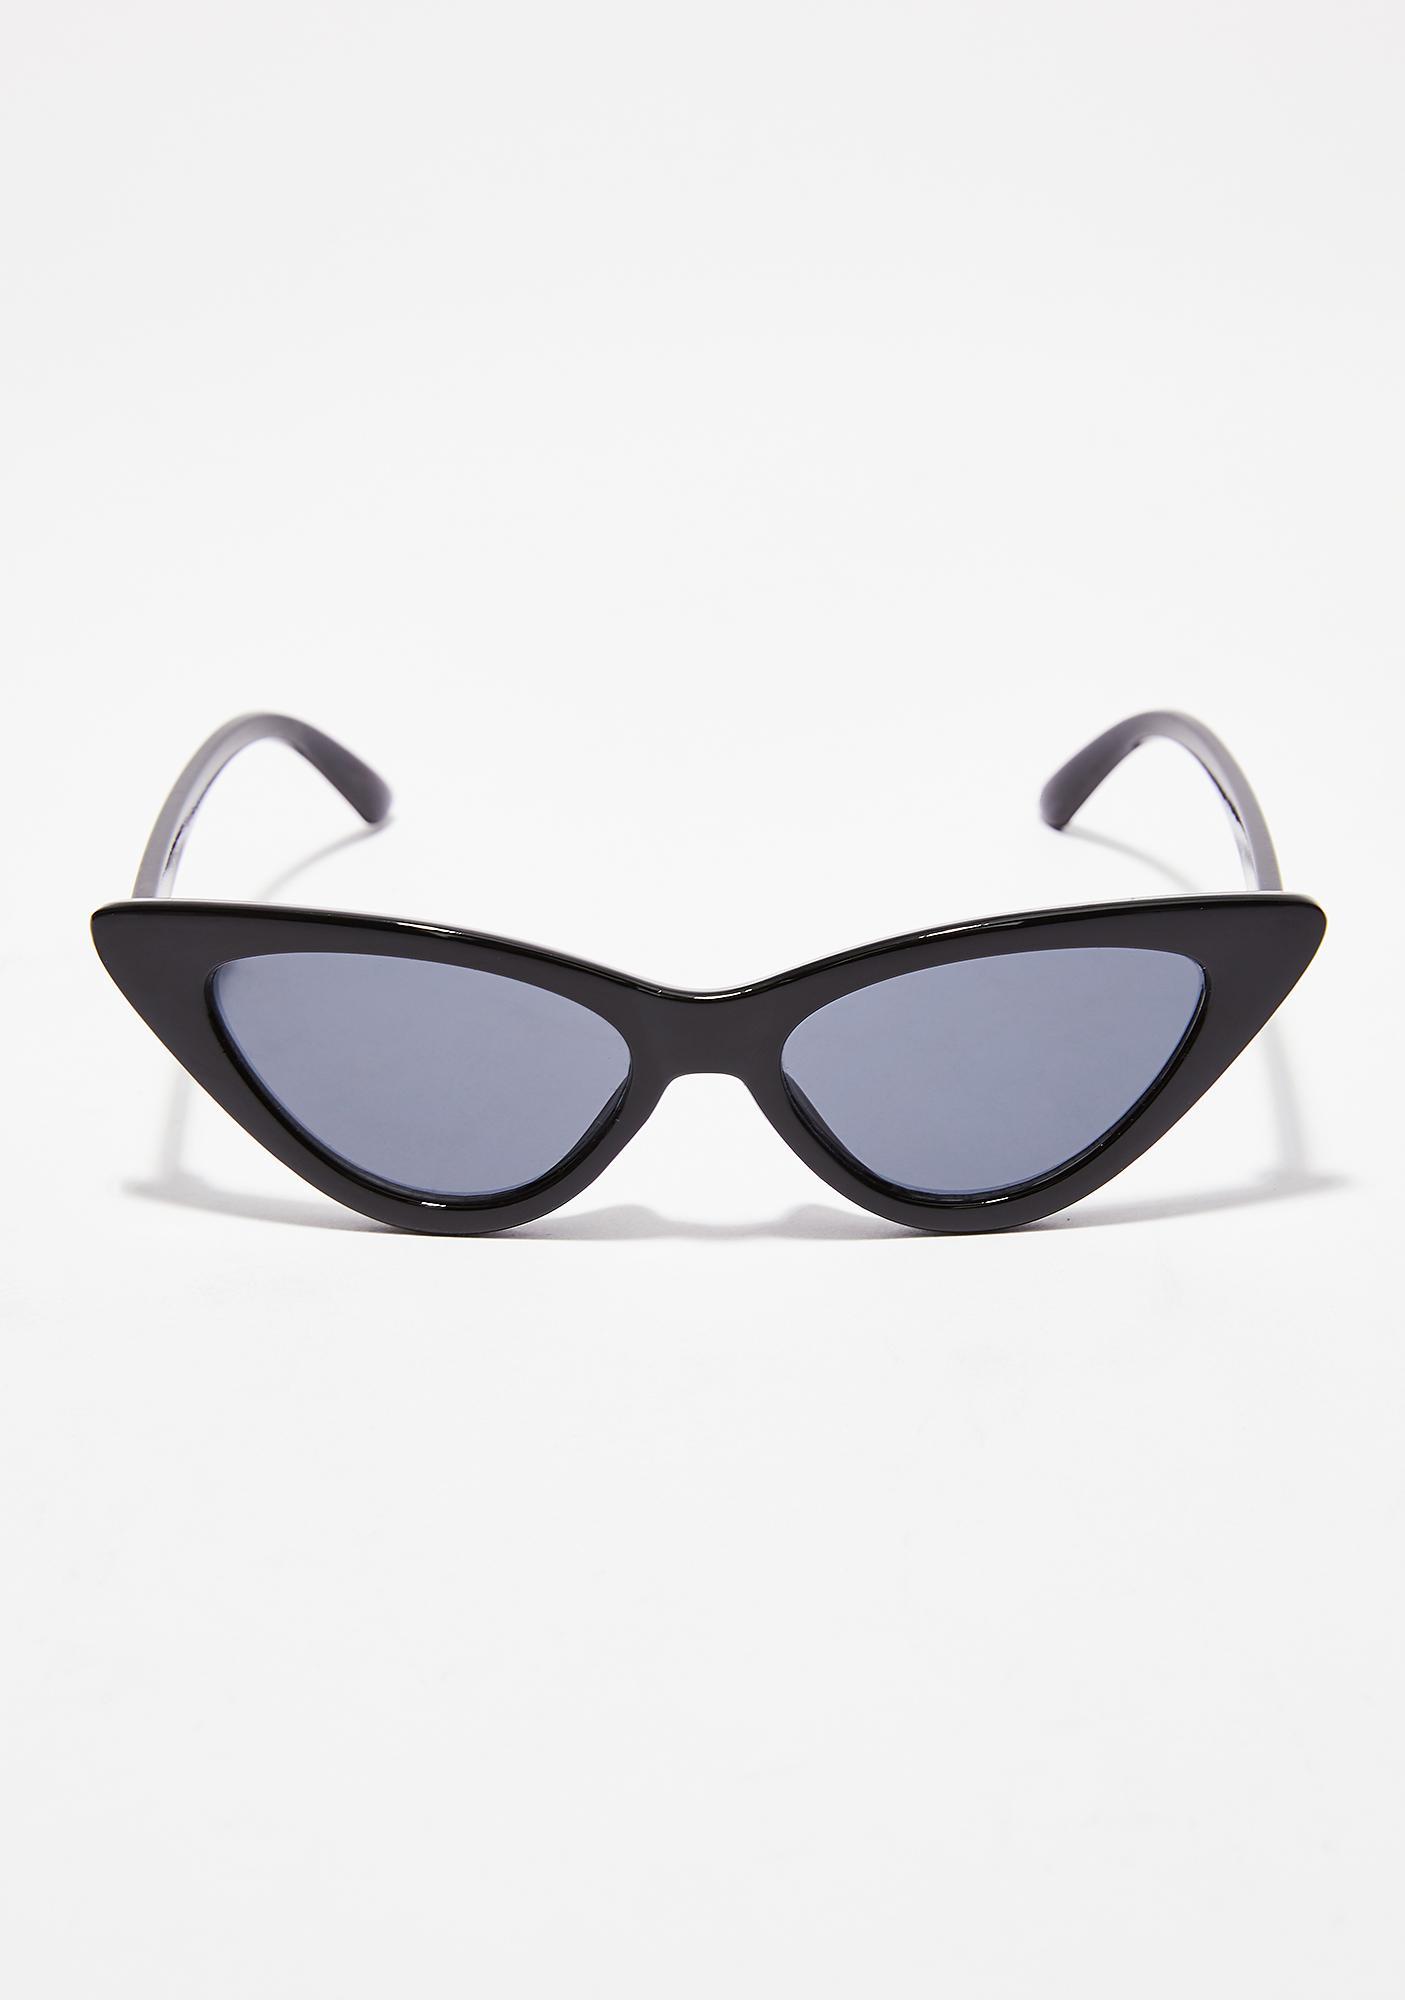 Dark Vibin' On Ya Sunglasses